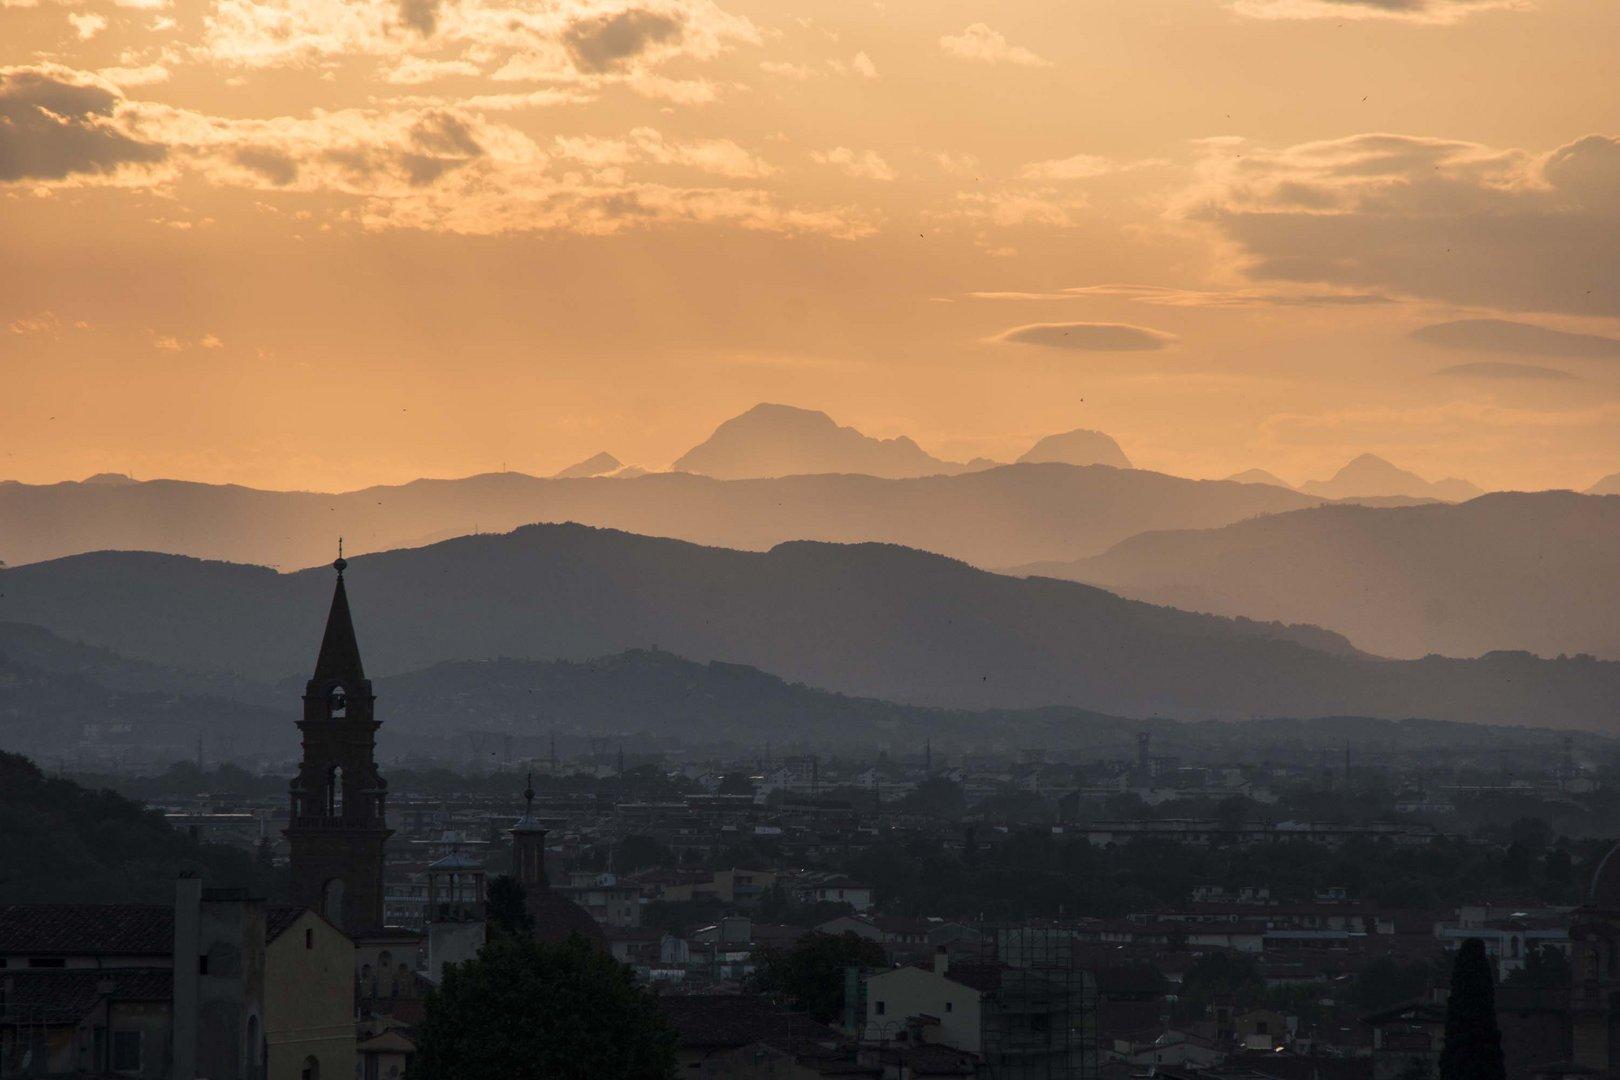 Sonnenuntergang in Florenz 2